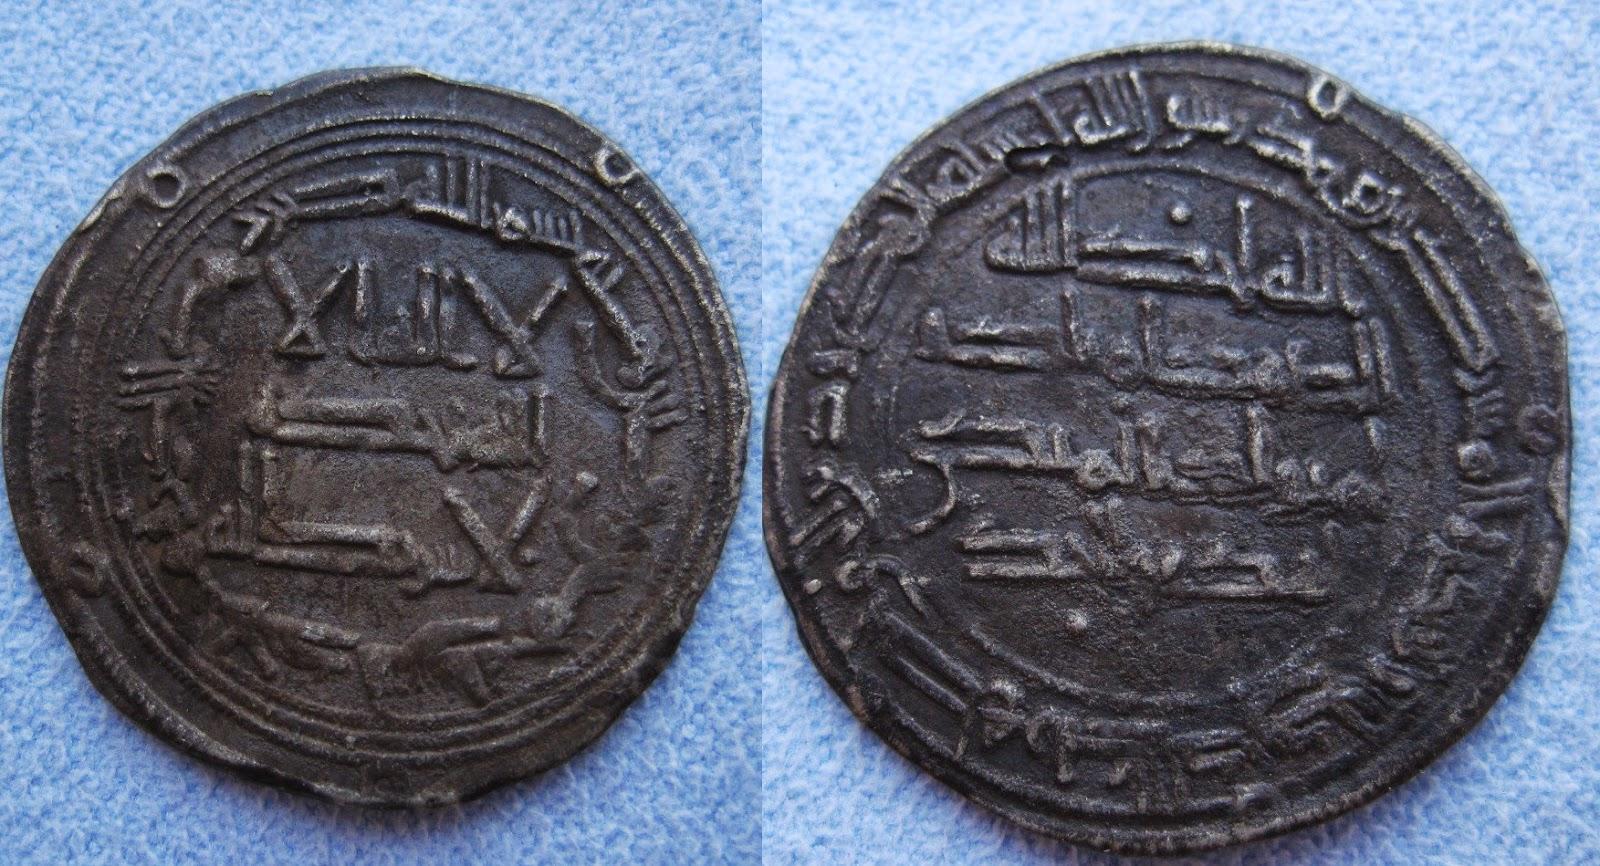 Dirham de Abd al-Rahman I, Al-Andalus, 165H IMG_1994